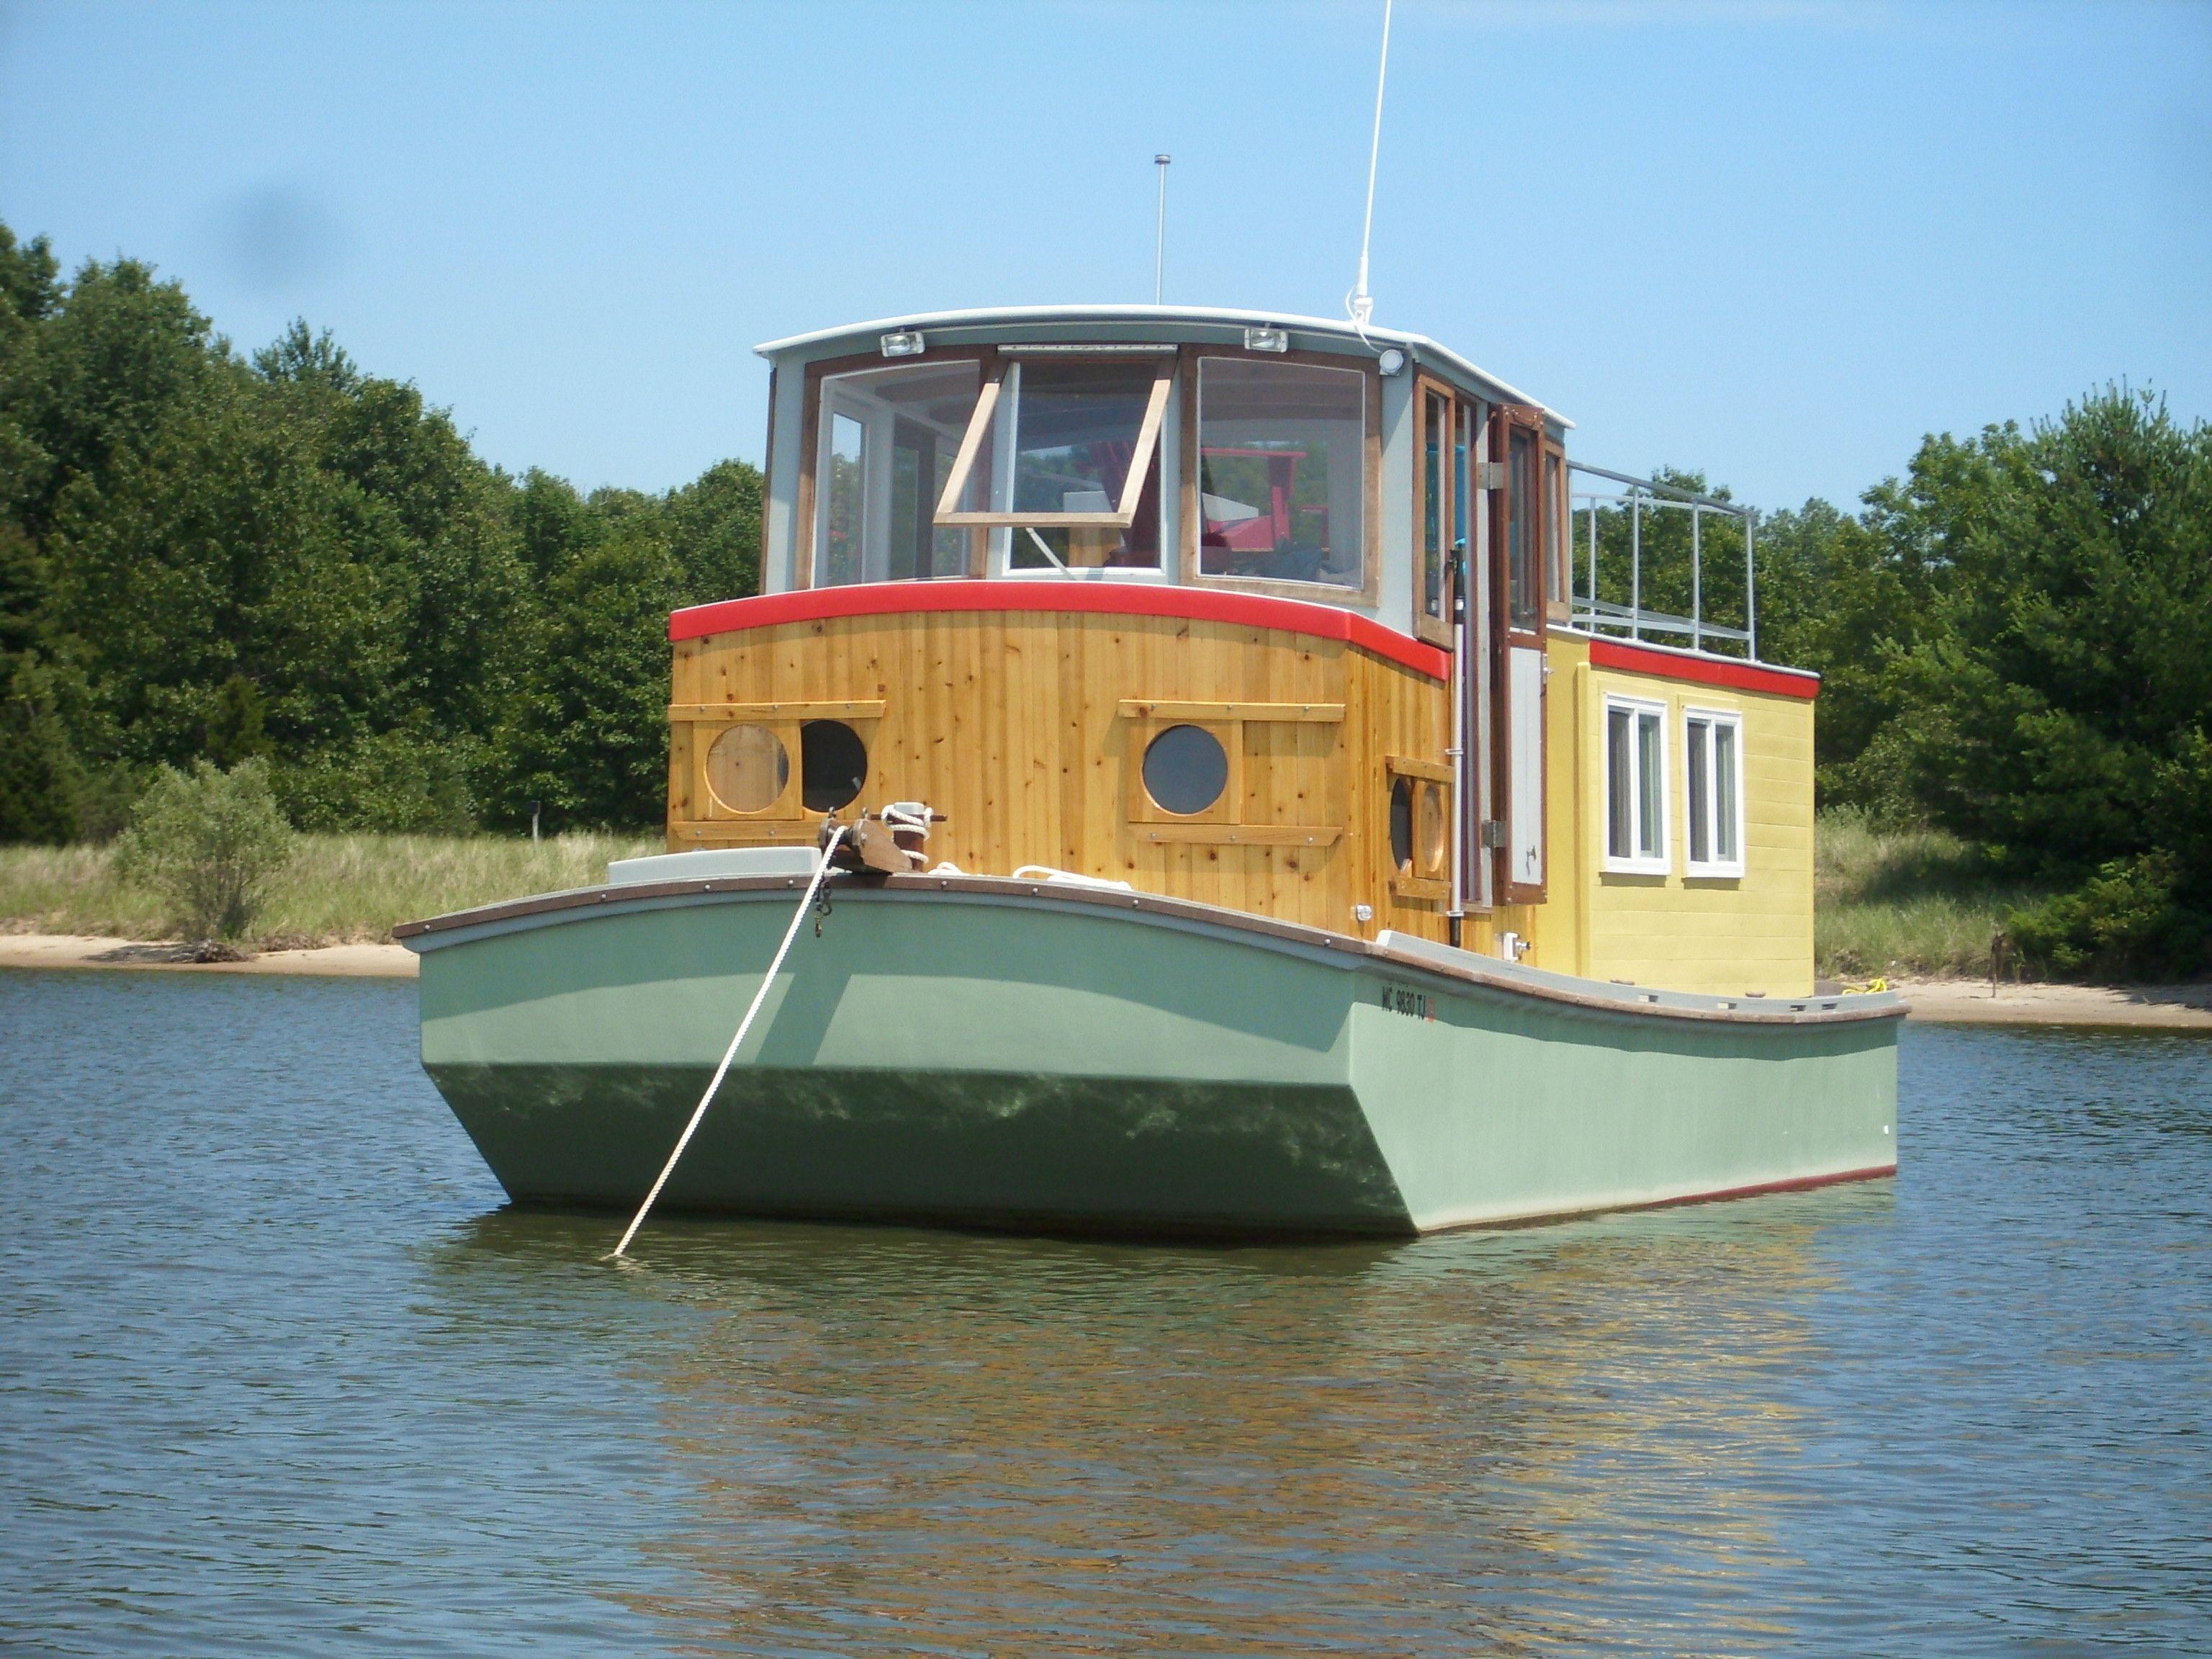 Small Houseboats Saugatuck Wooden Boat Cruises Tours